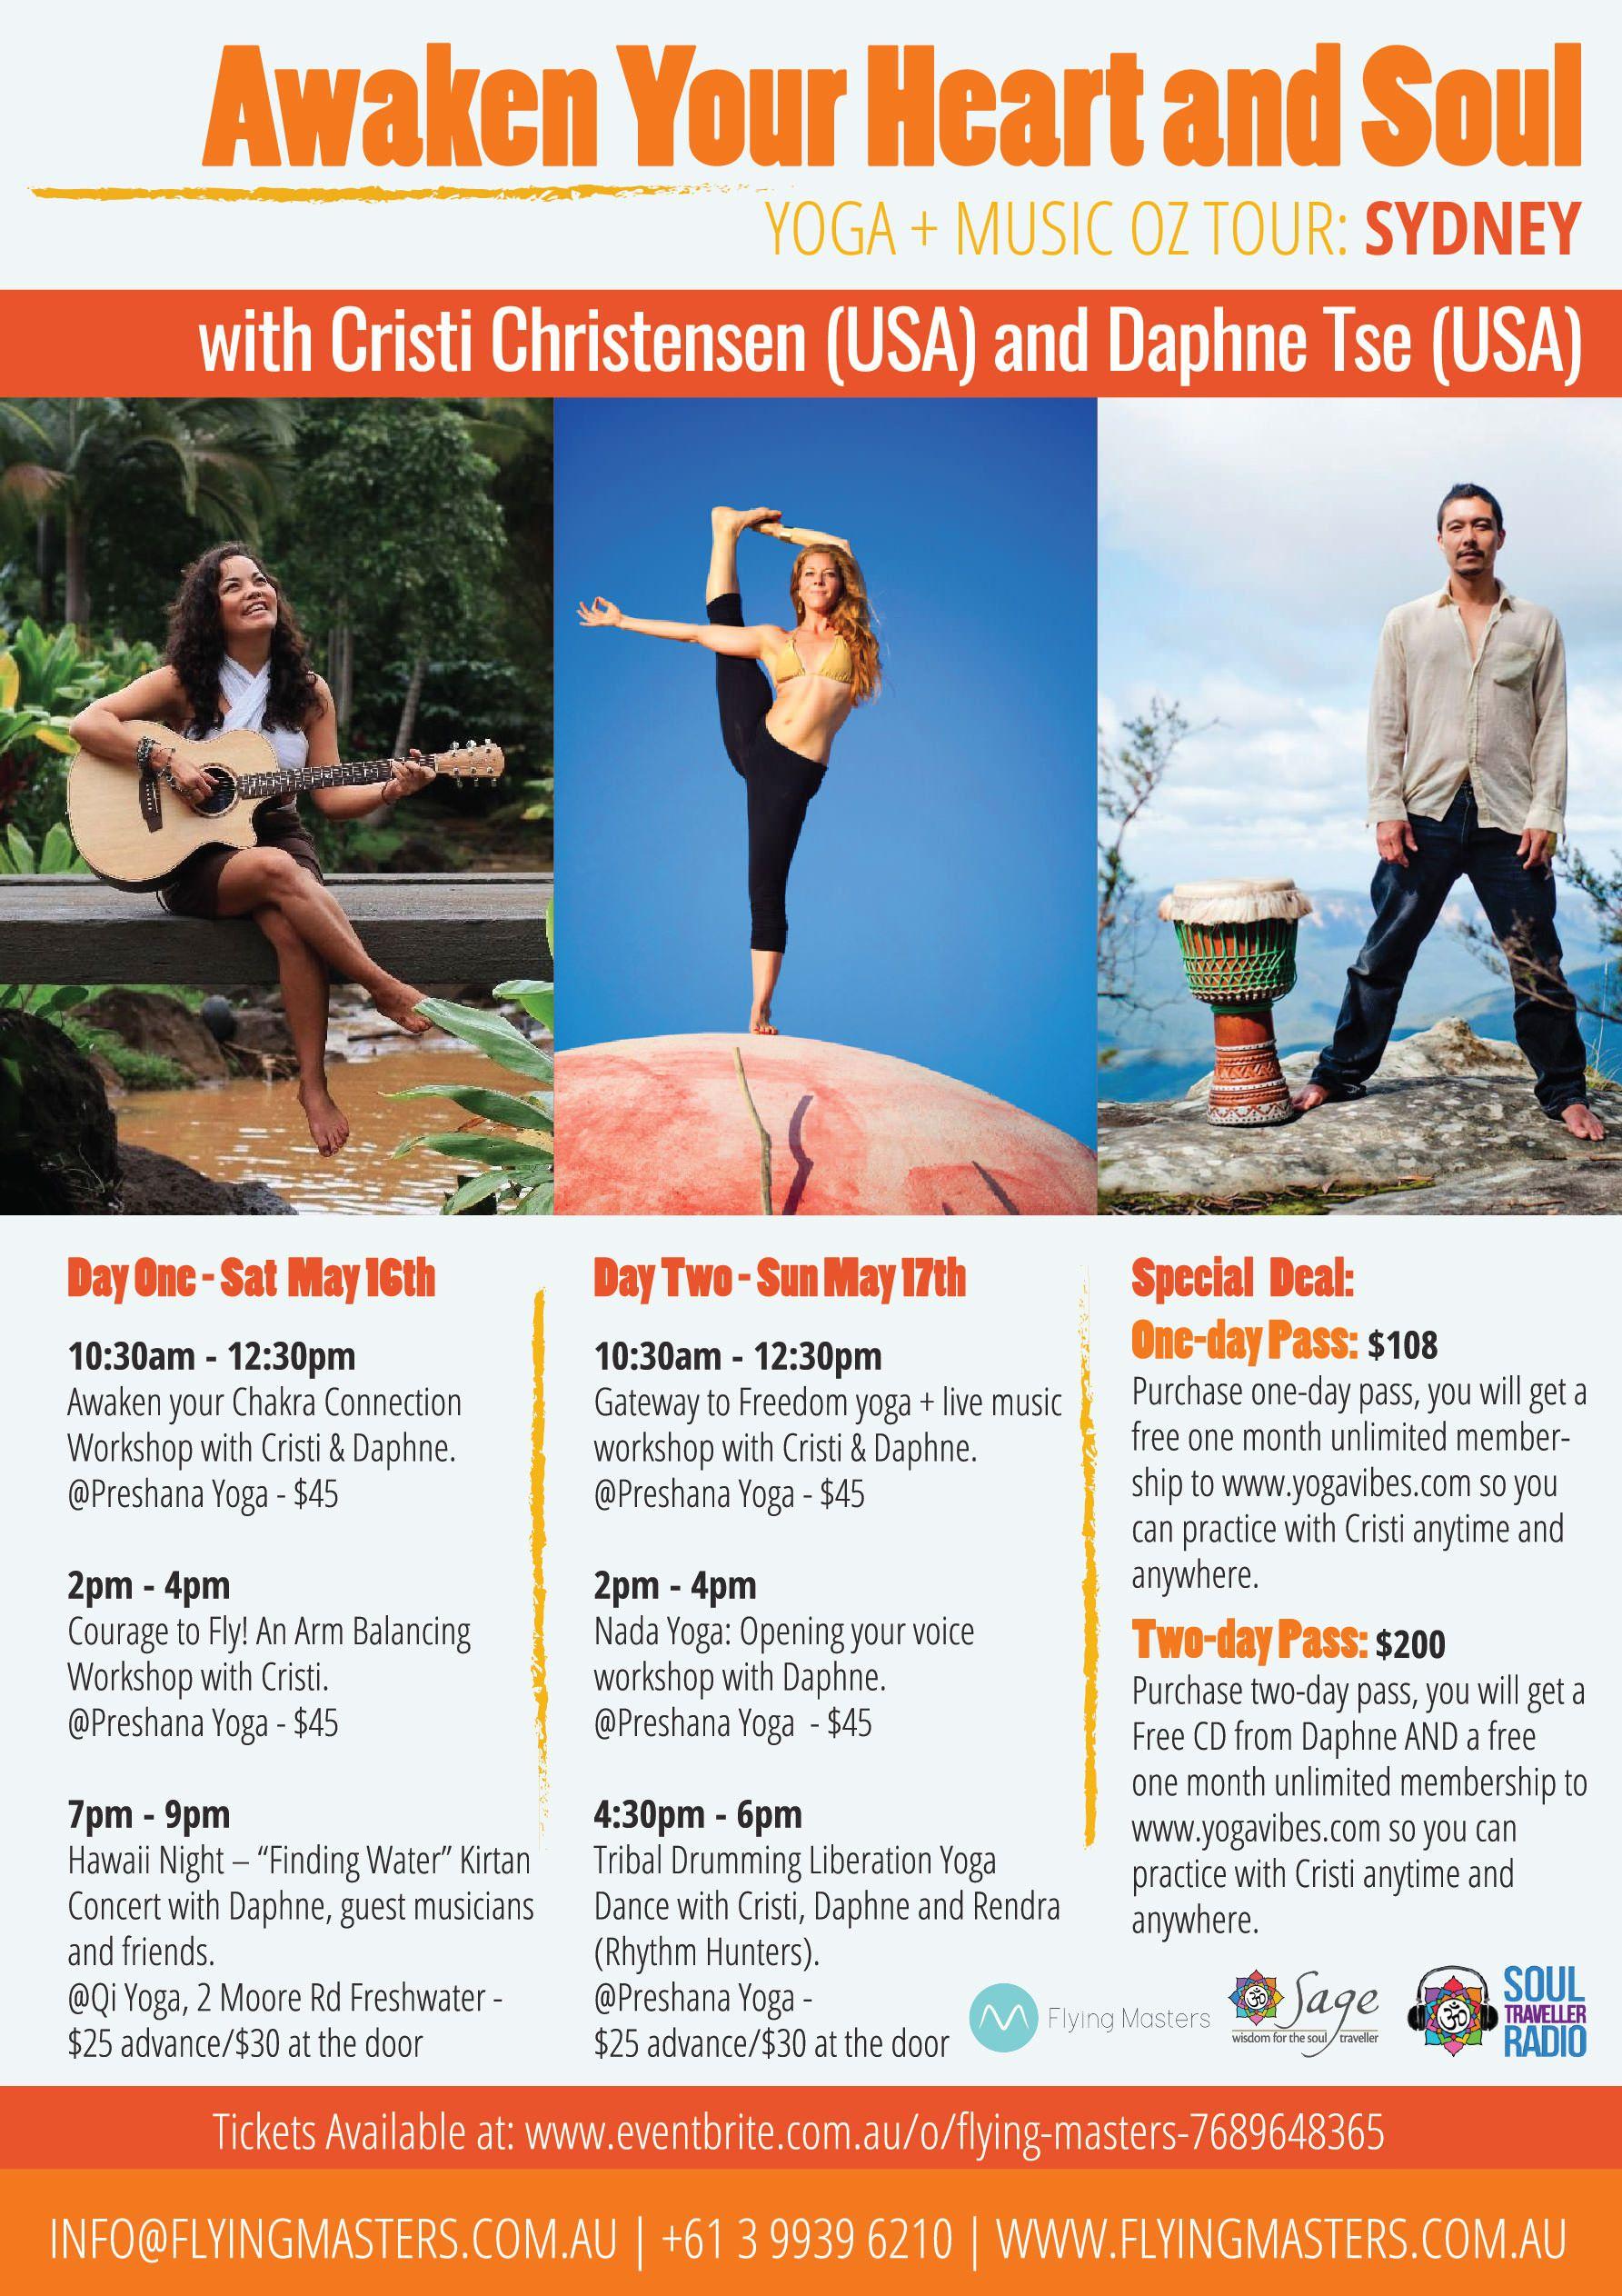 Poster design workshop - Cristi Christensen And Daphne Tse Yoga Workshop Poster Design By Hey Yogi